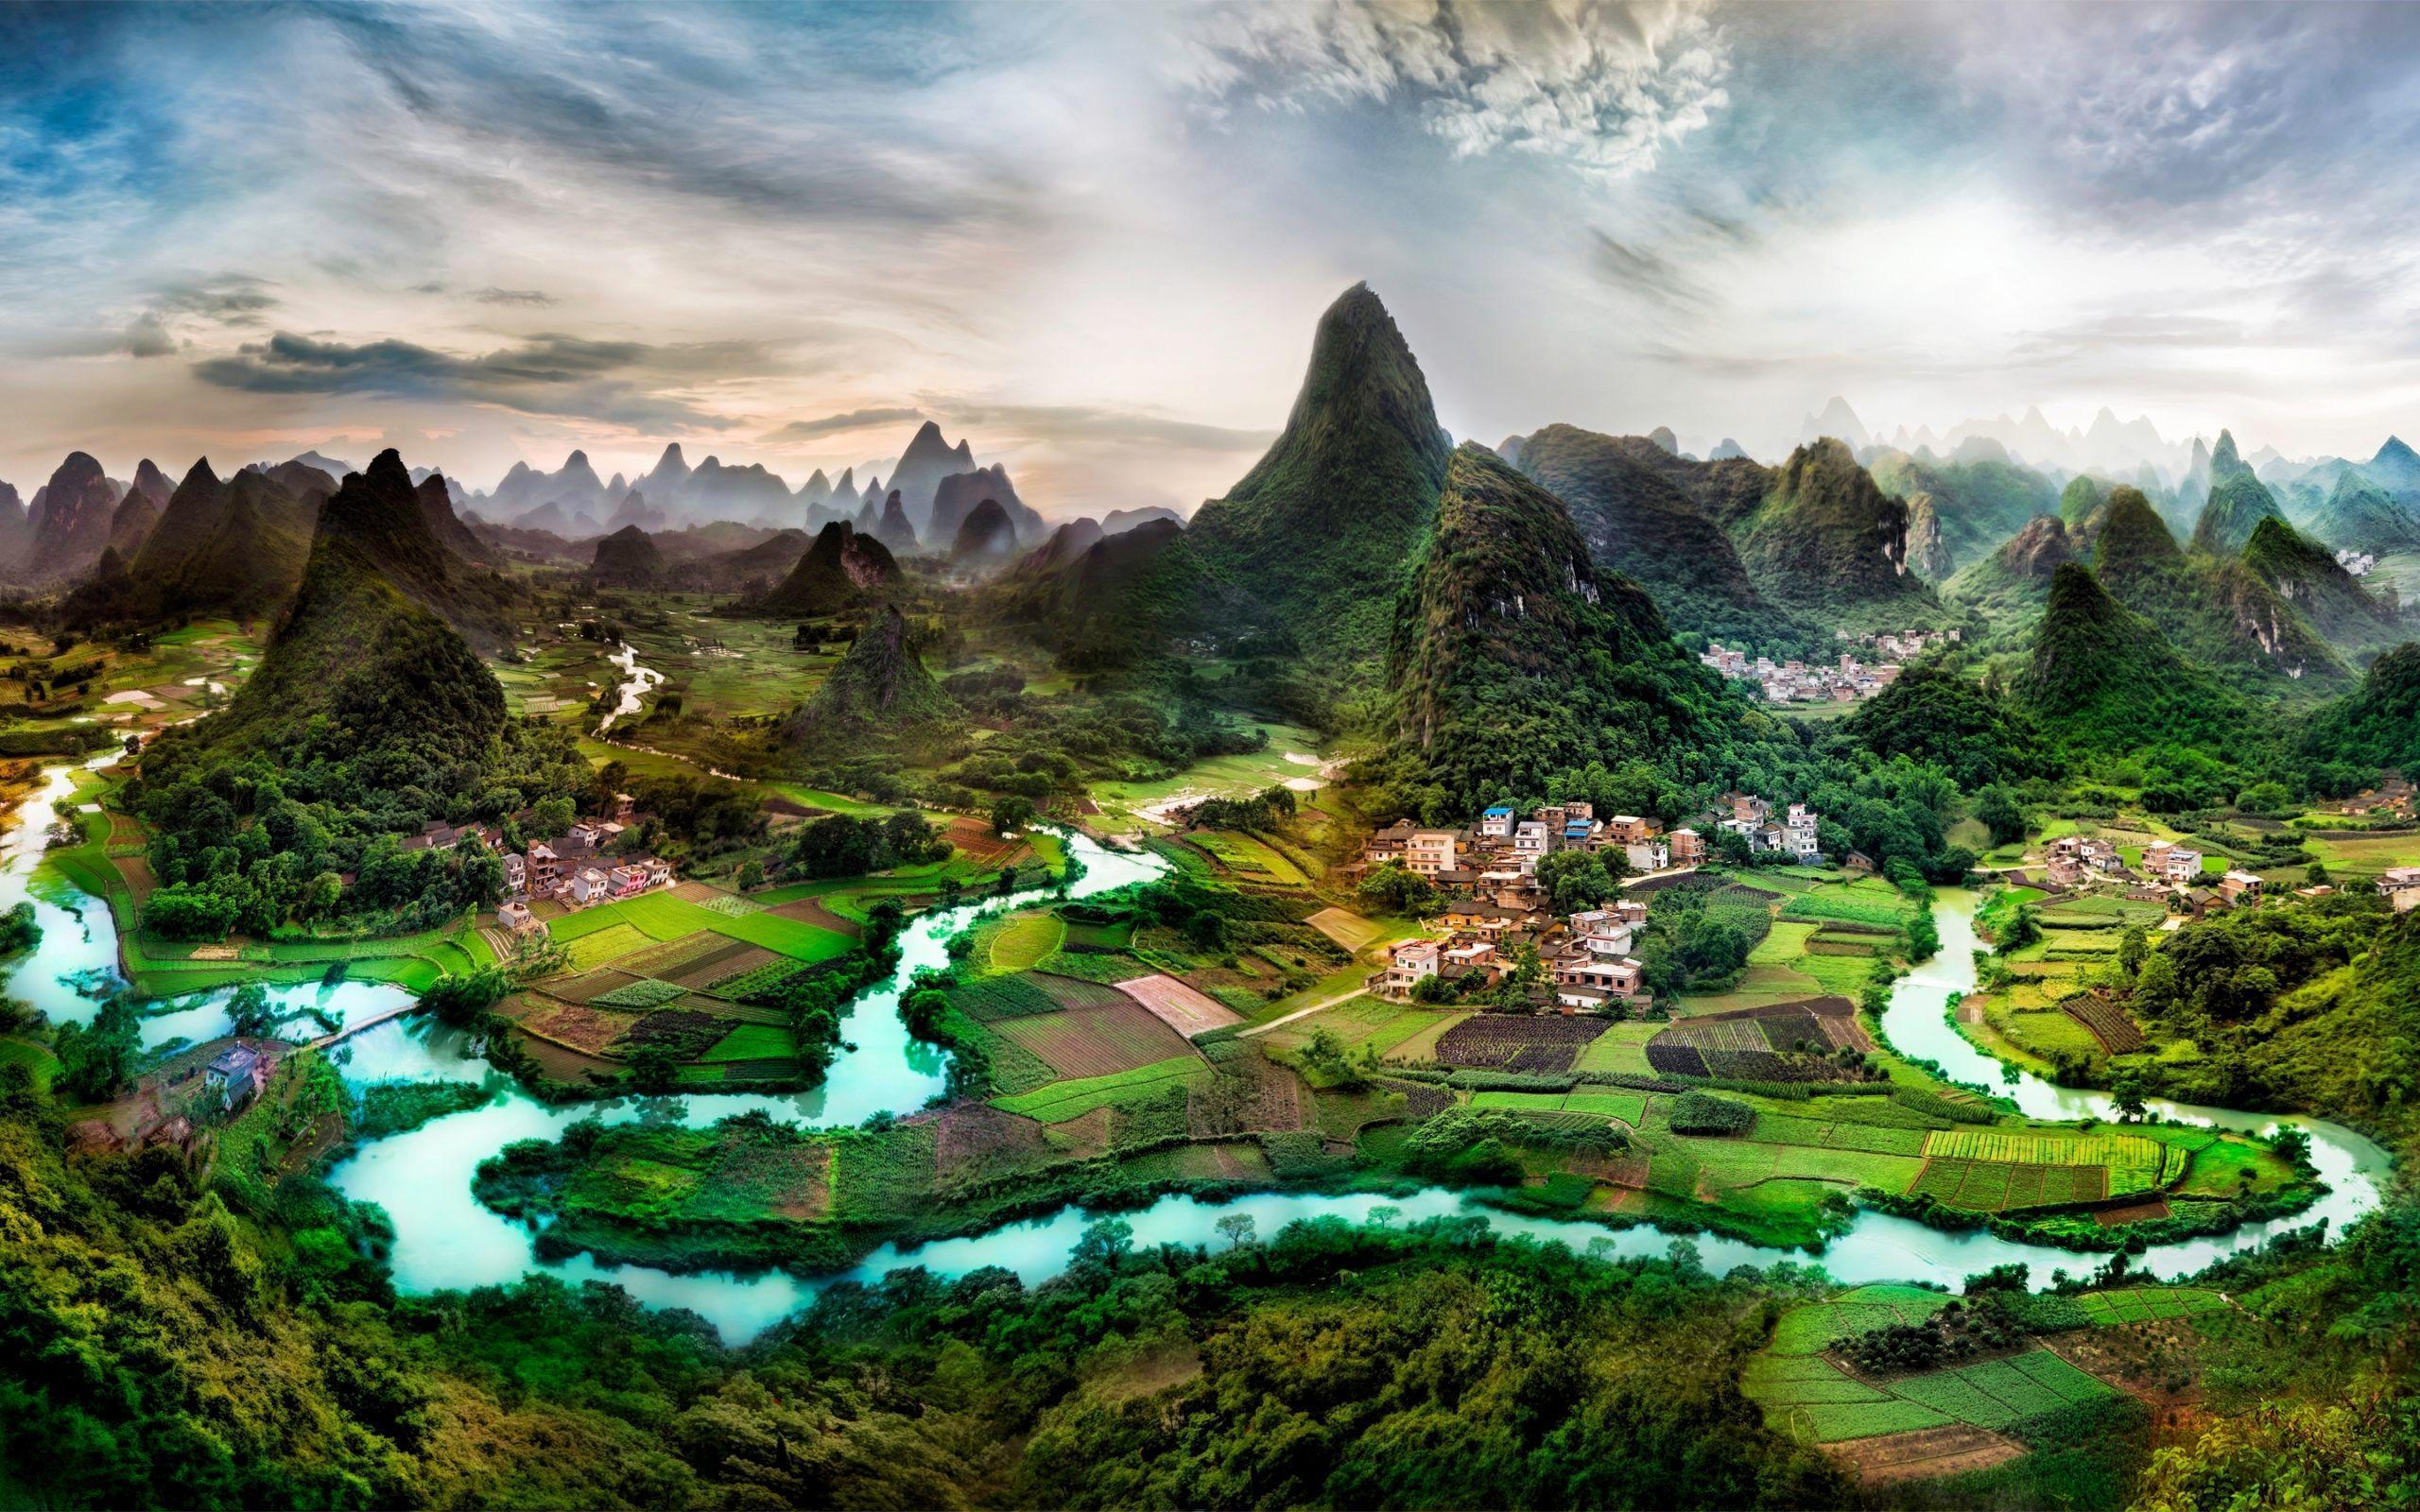 Top Free Landscape Backgrounds